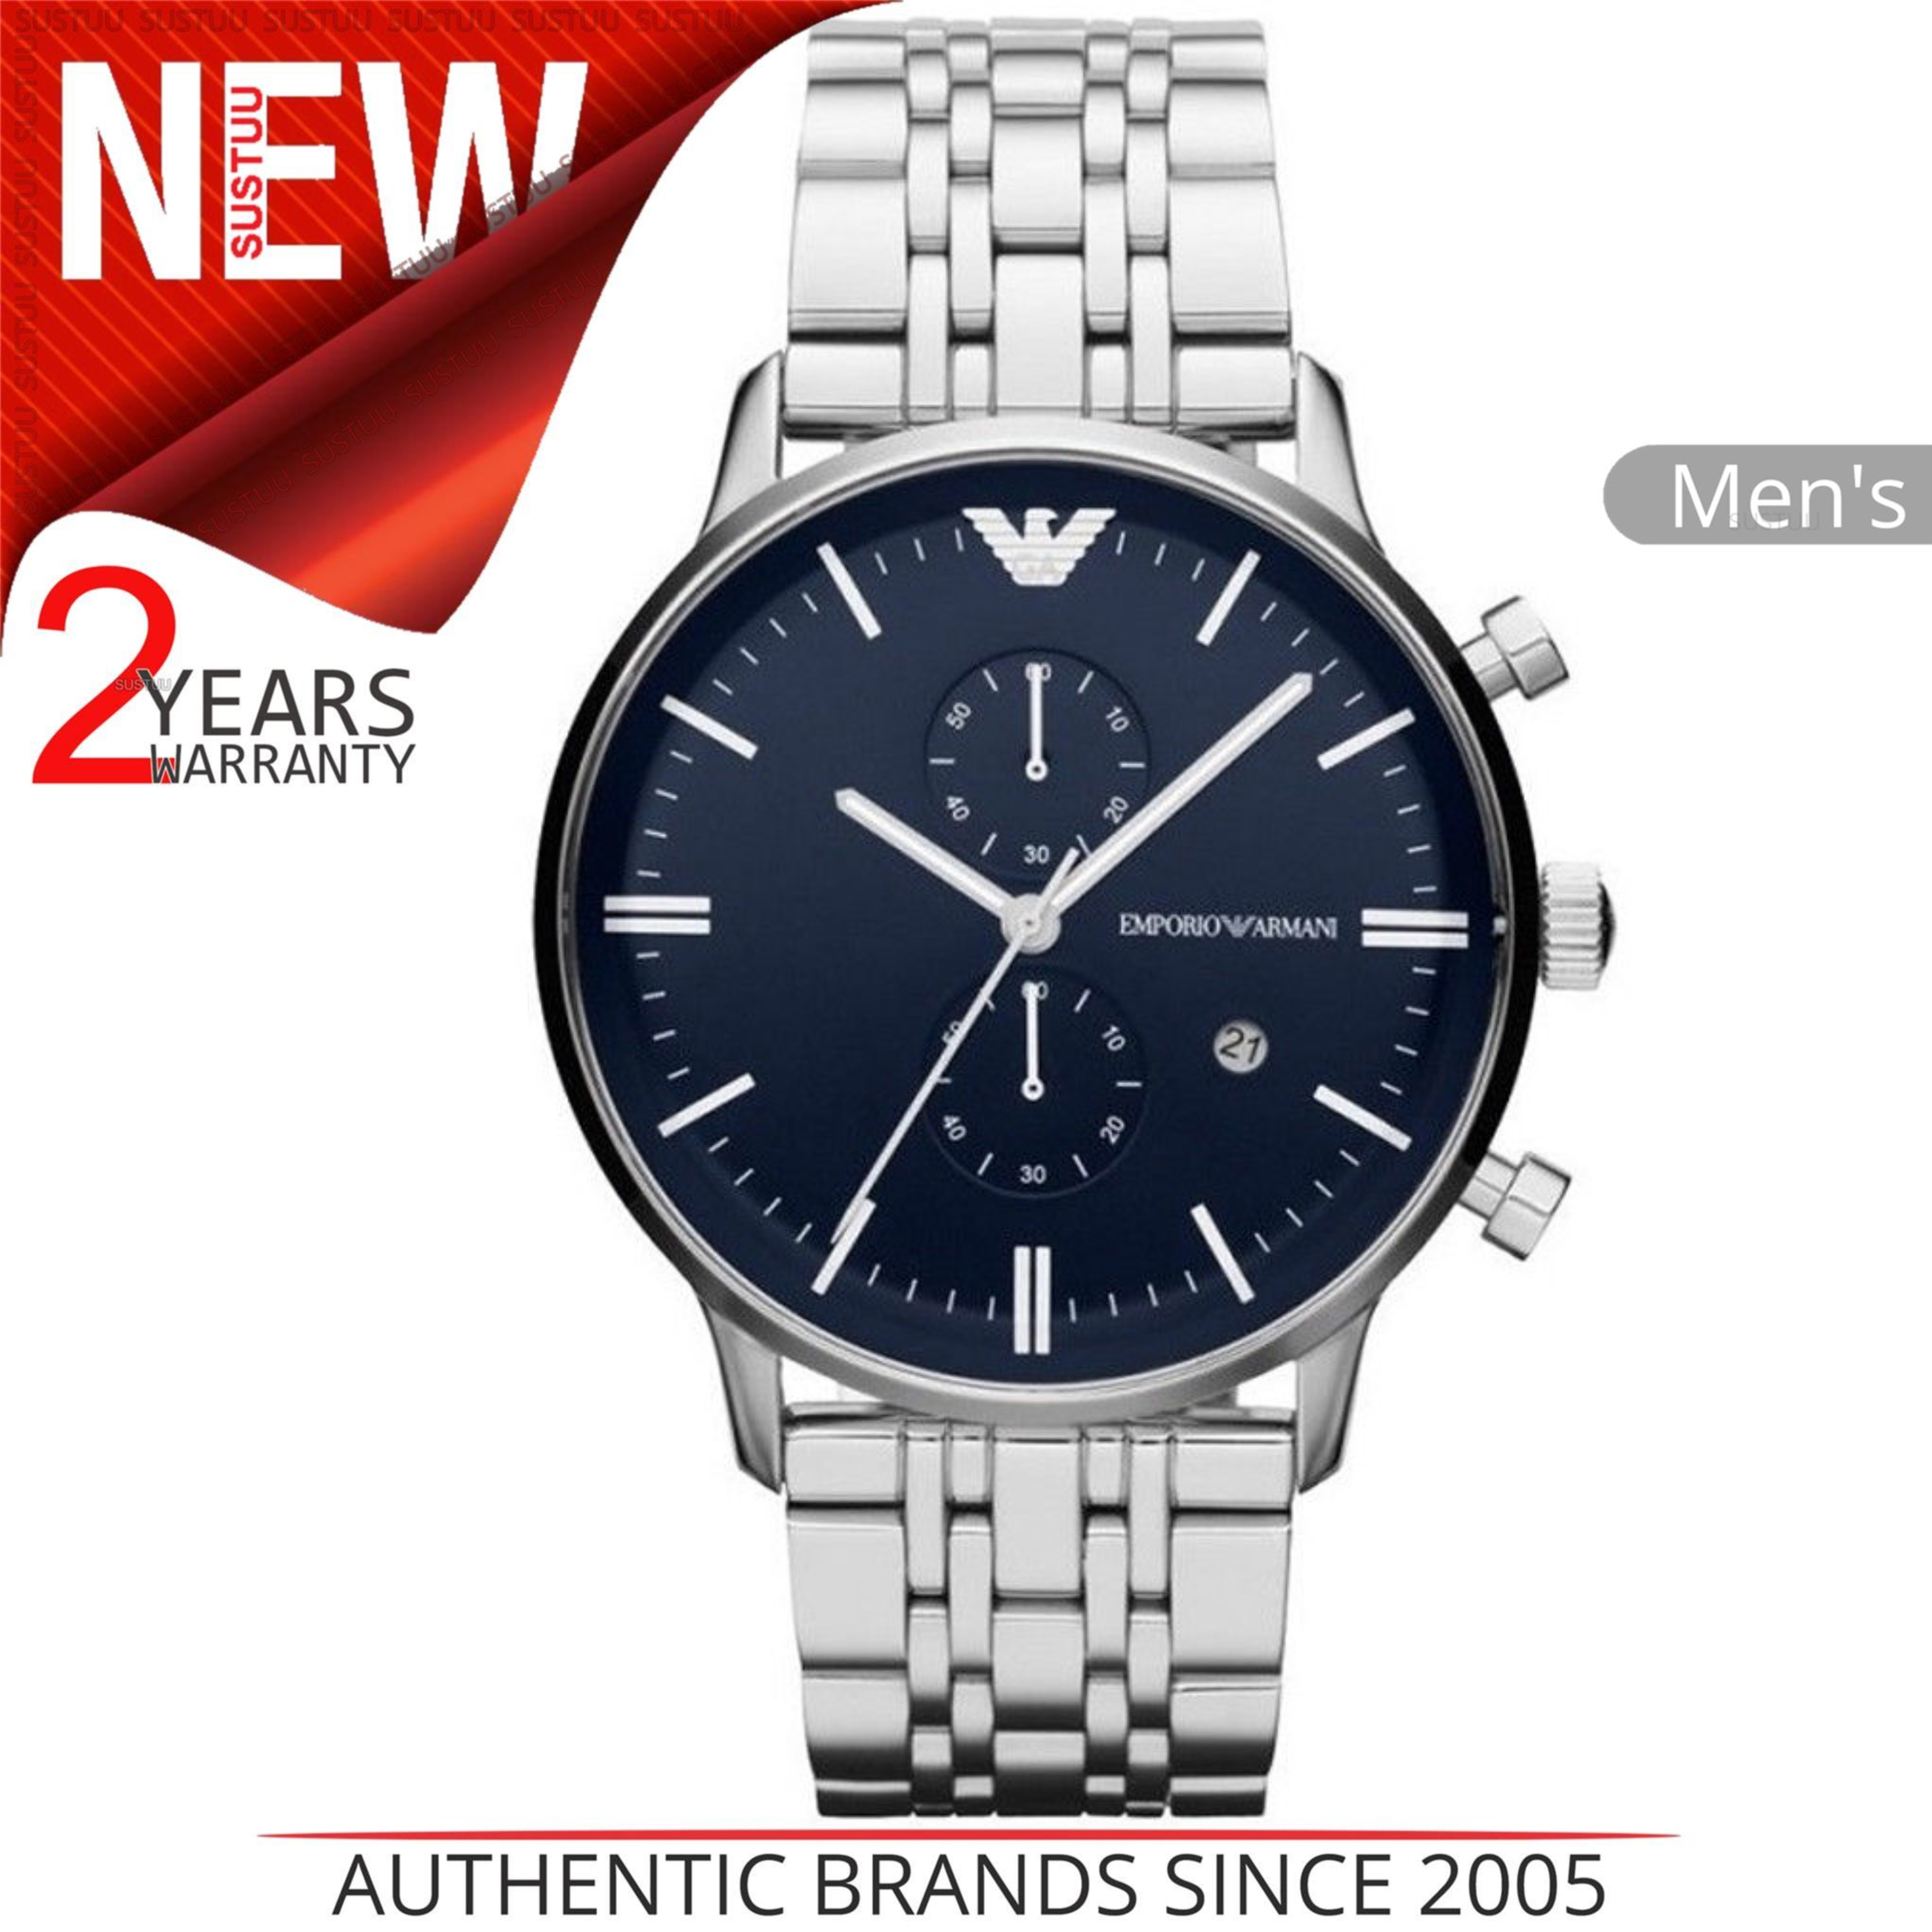 537f463c039a2 Sentinel Emporio Armani Men s Classic Watch│Dark Blue Dial│Stainless Steel  Strap│AR1648